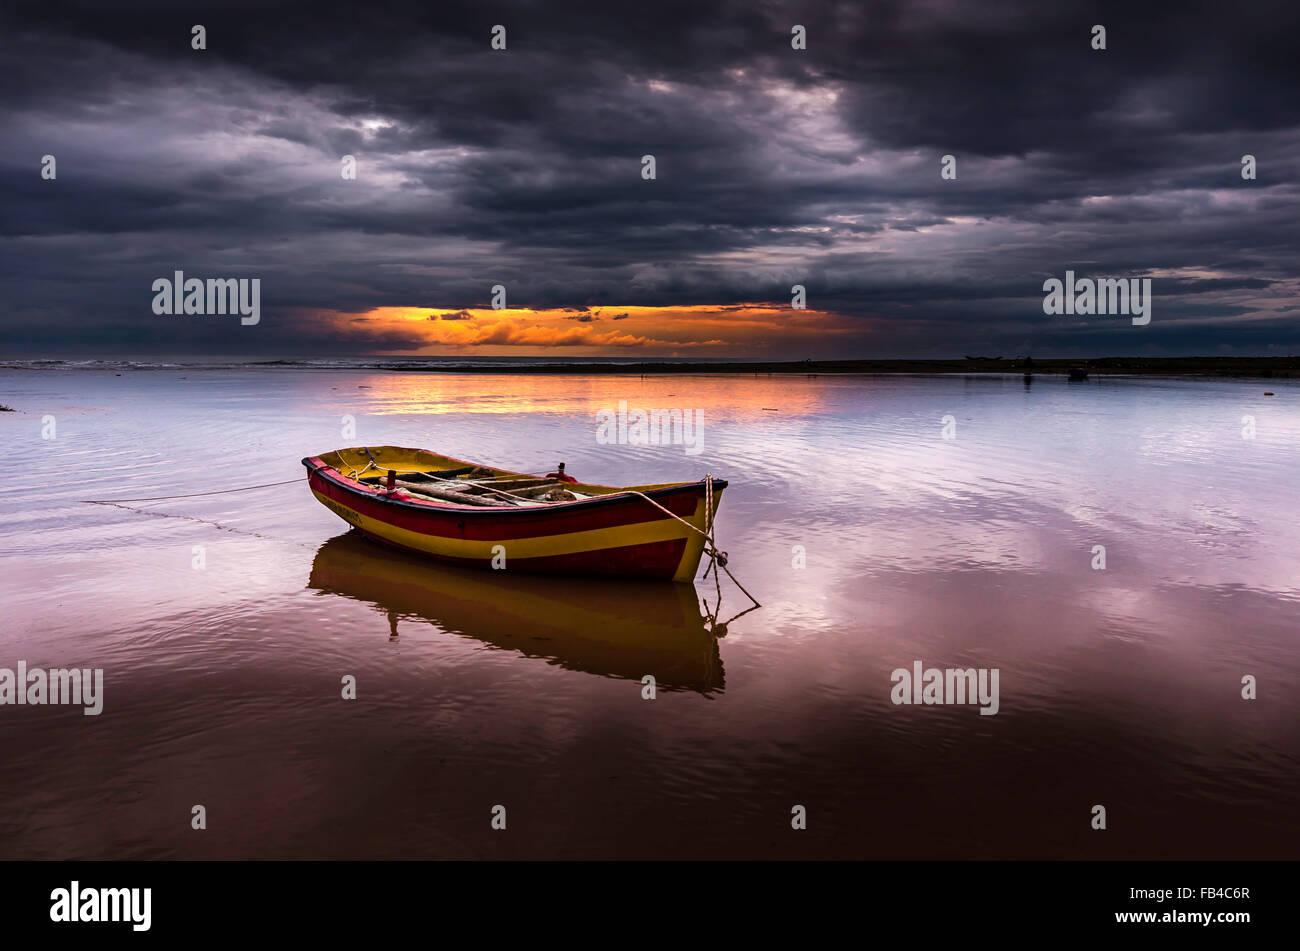 Peacefulness - Stock Image